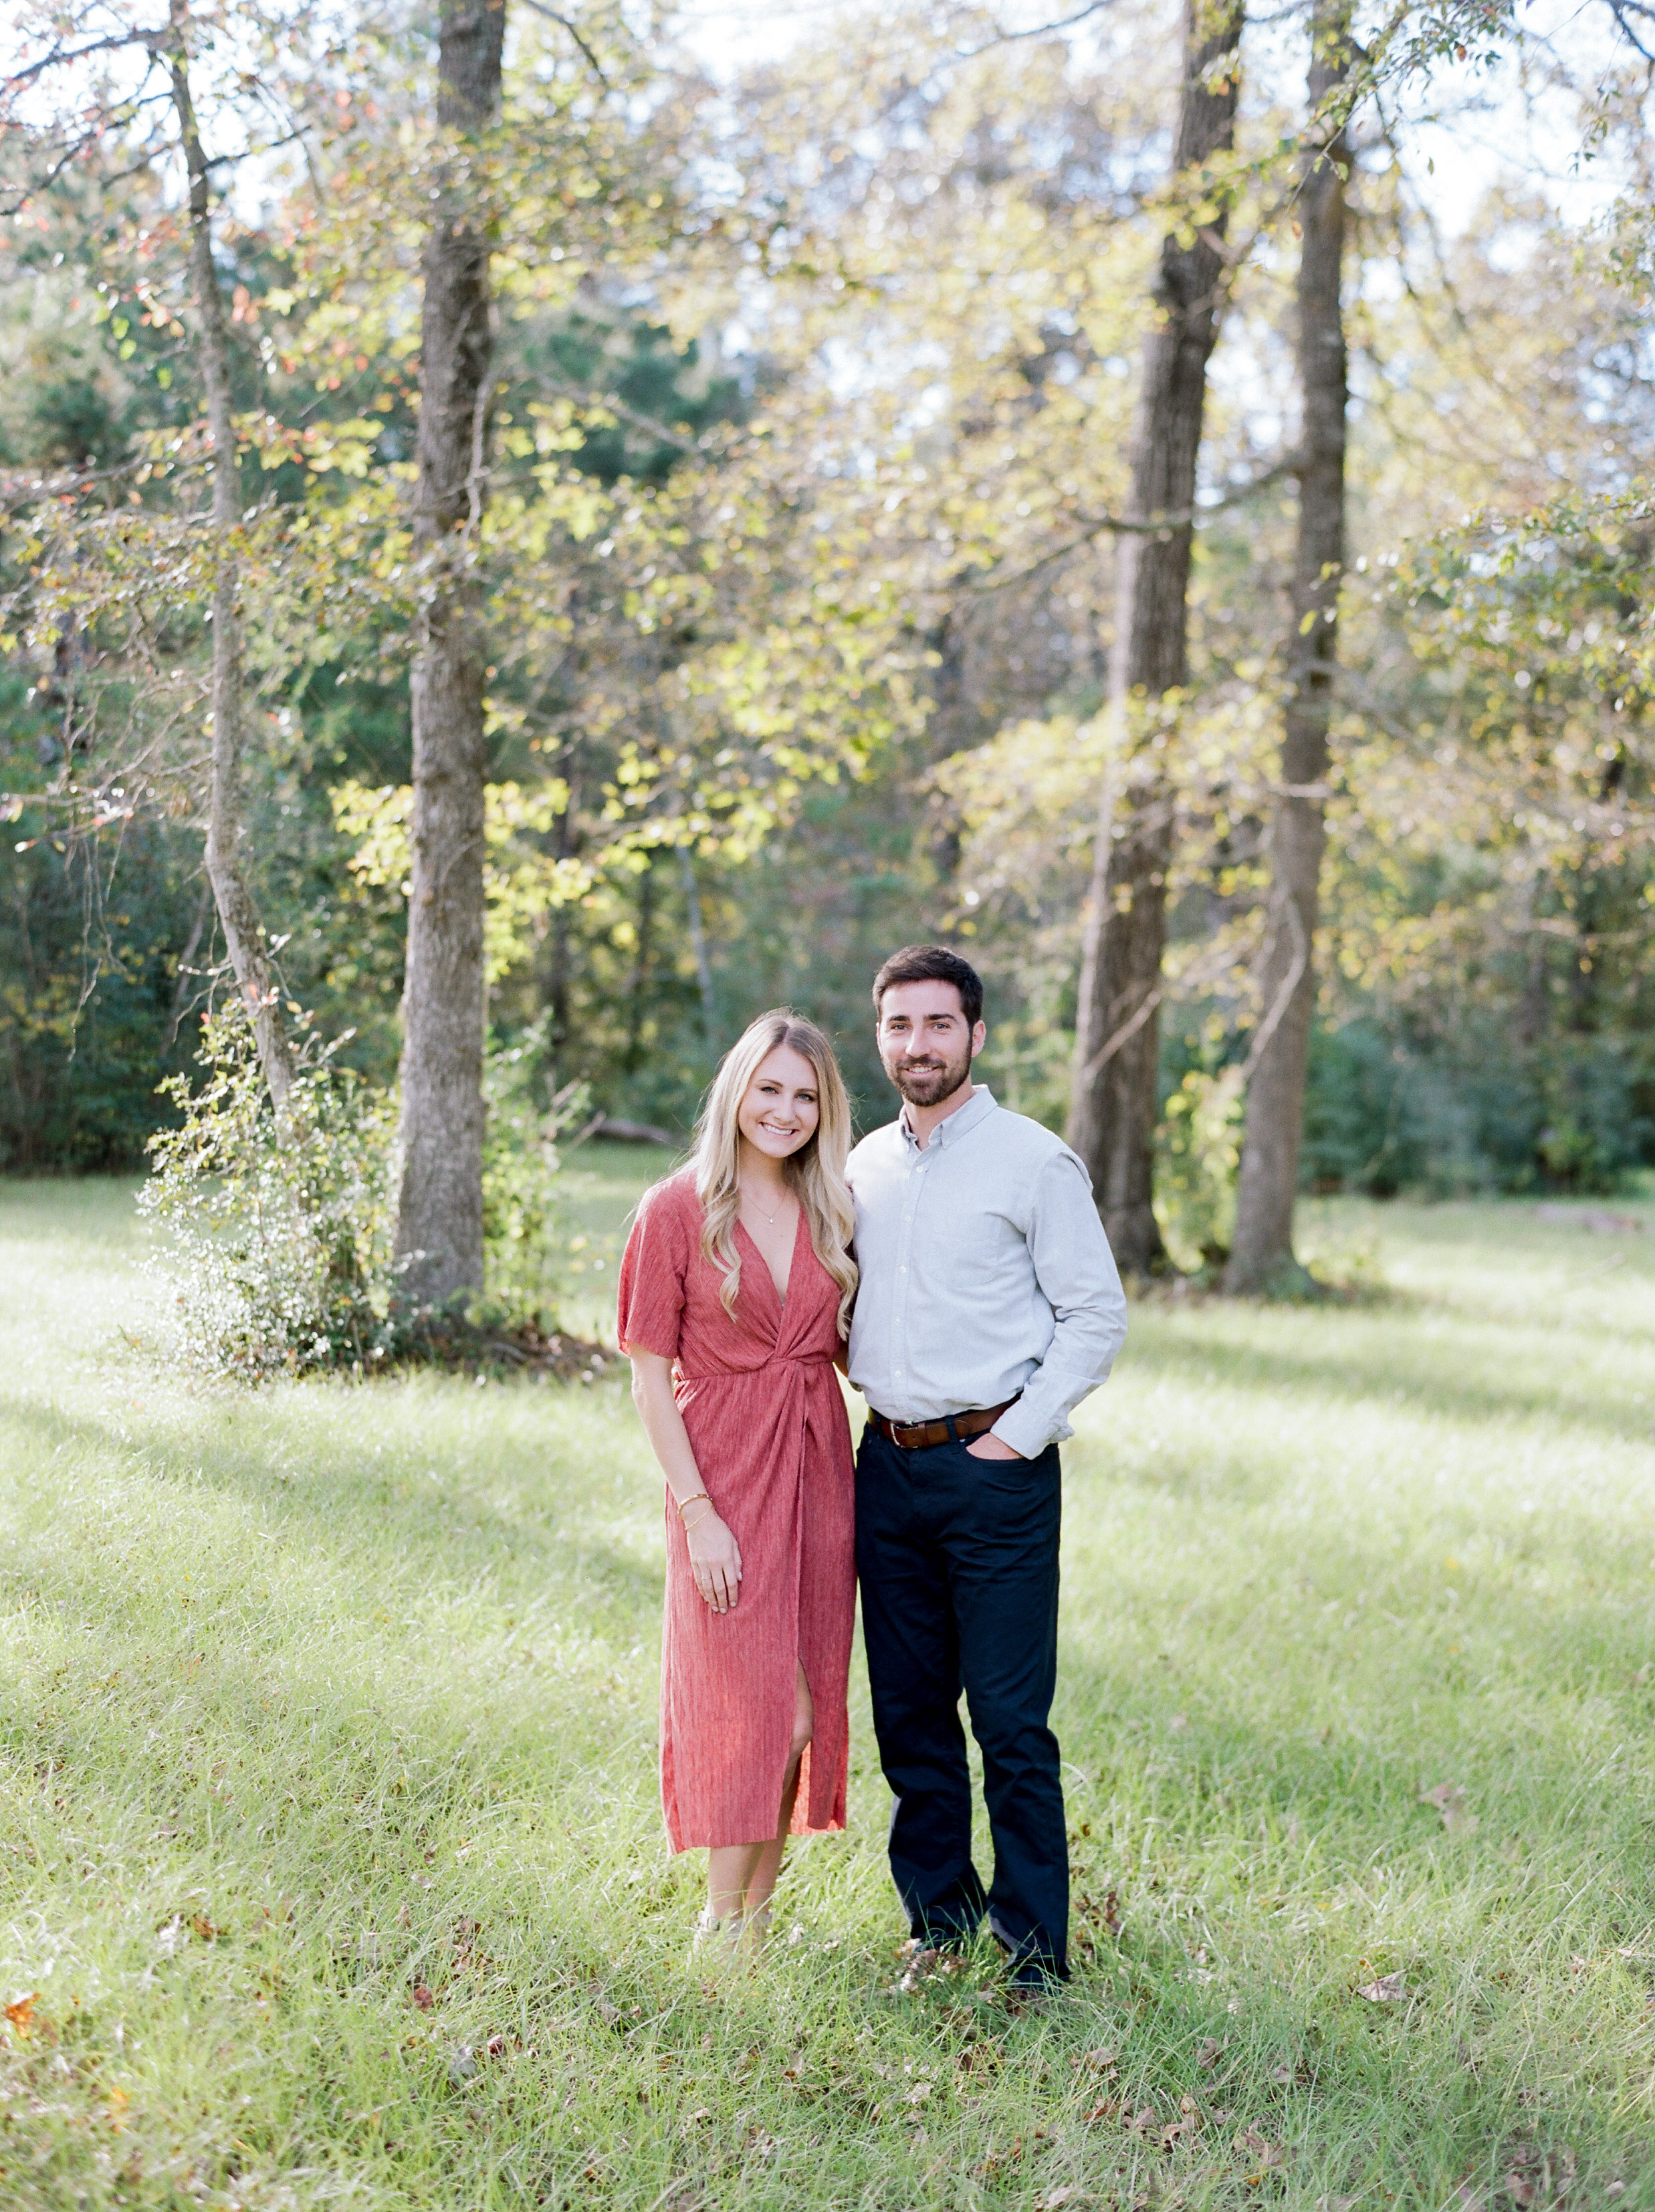 Houston-Fine-Art-Film-Destination-Wedding-Photographer-Top-Best-Luxury-Josh-Dana-Fernandez-Photographer-Austin-Texas-21.jpg